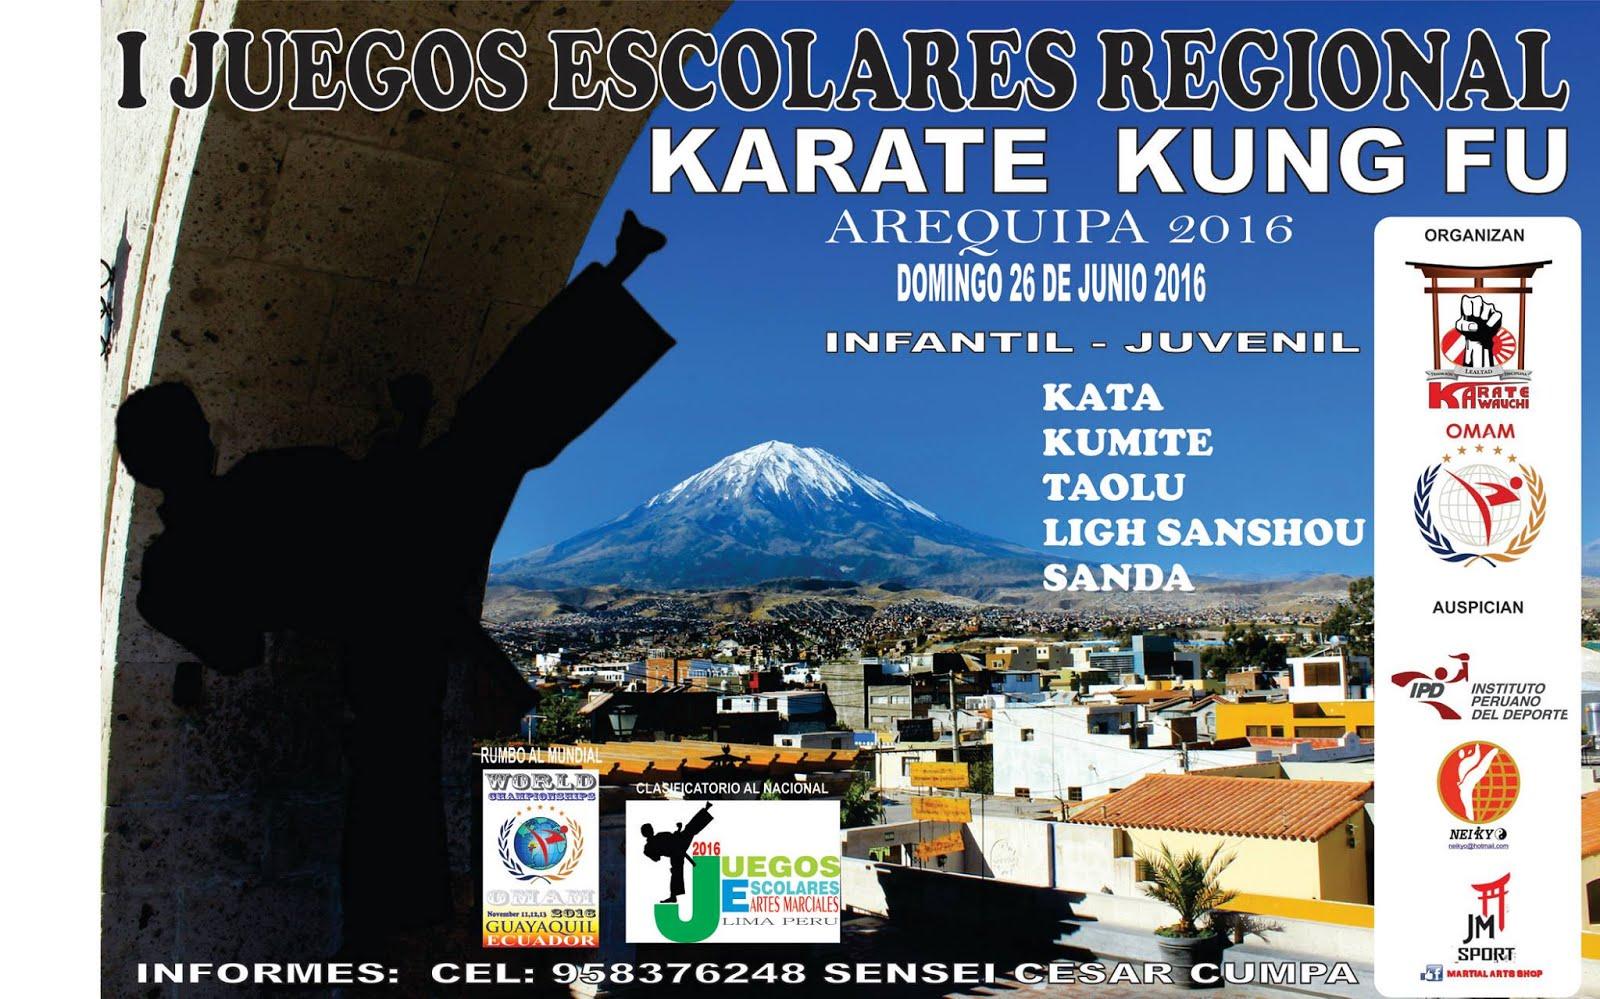 I JUEGOS ESCOLARES REGIONAL Karate - KungFu Arequipa-Perù